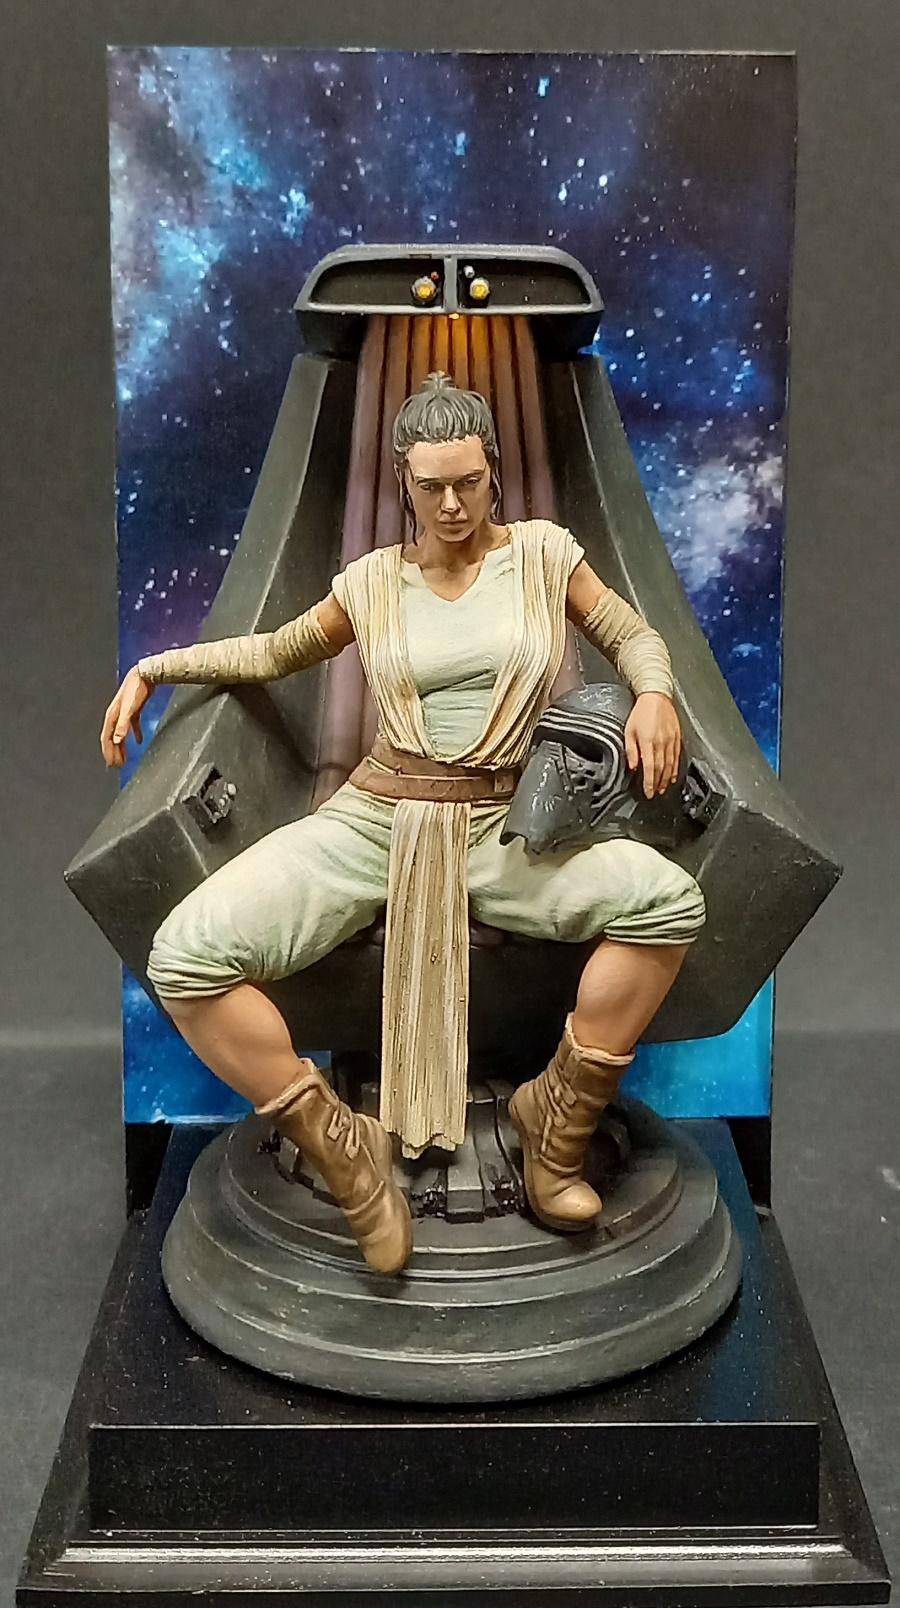 Rey Skywalker terminée - Page 2 Rey_1510